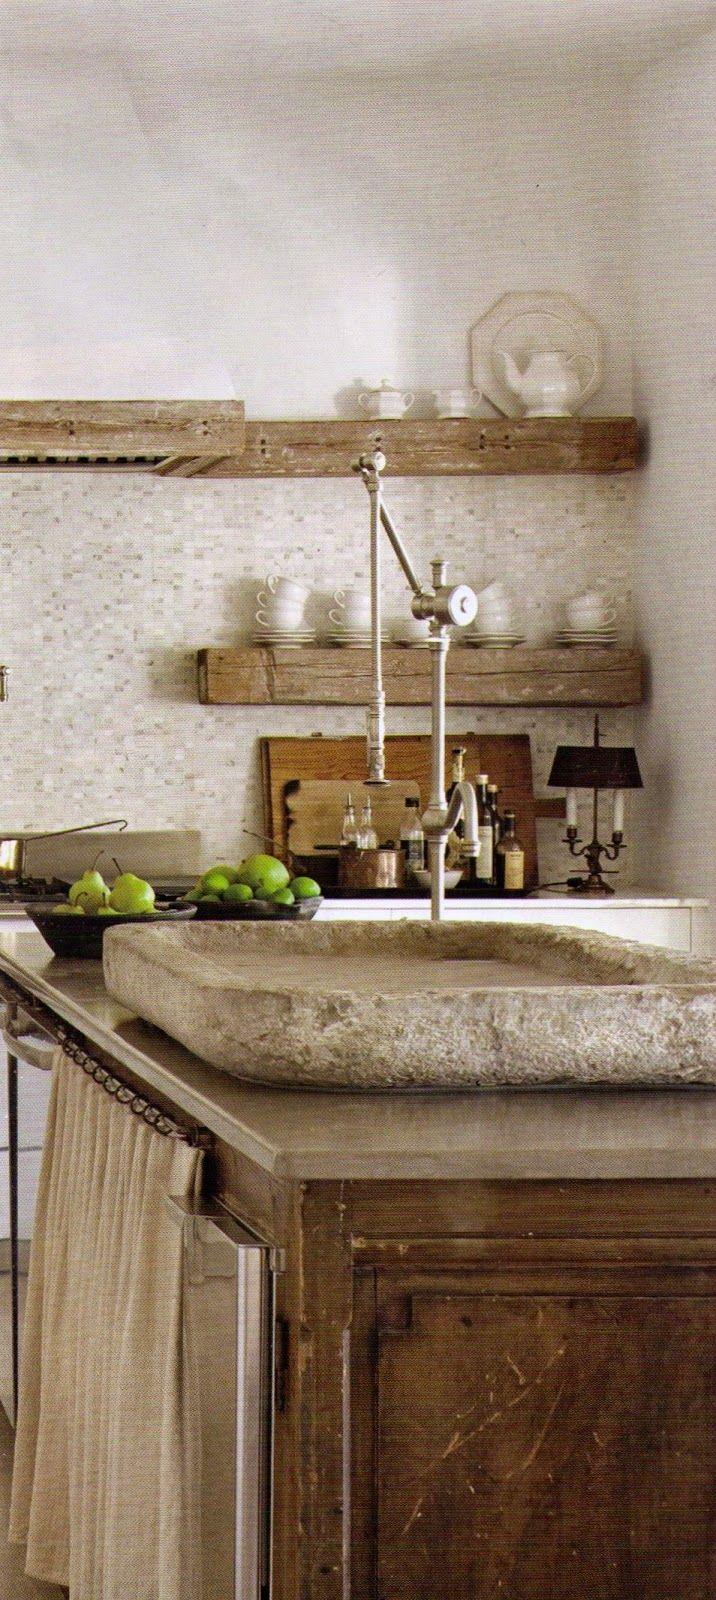 love the stone slab reclaimed island w reclaimed timber shelves - Stone Slab Kitchen Decor